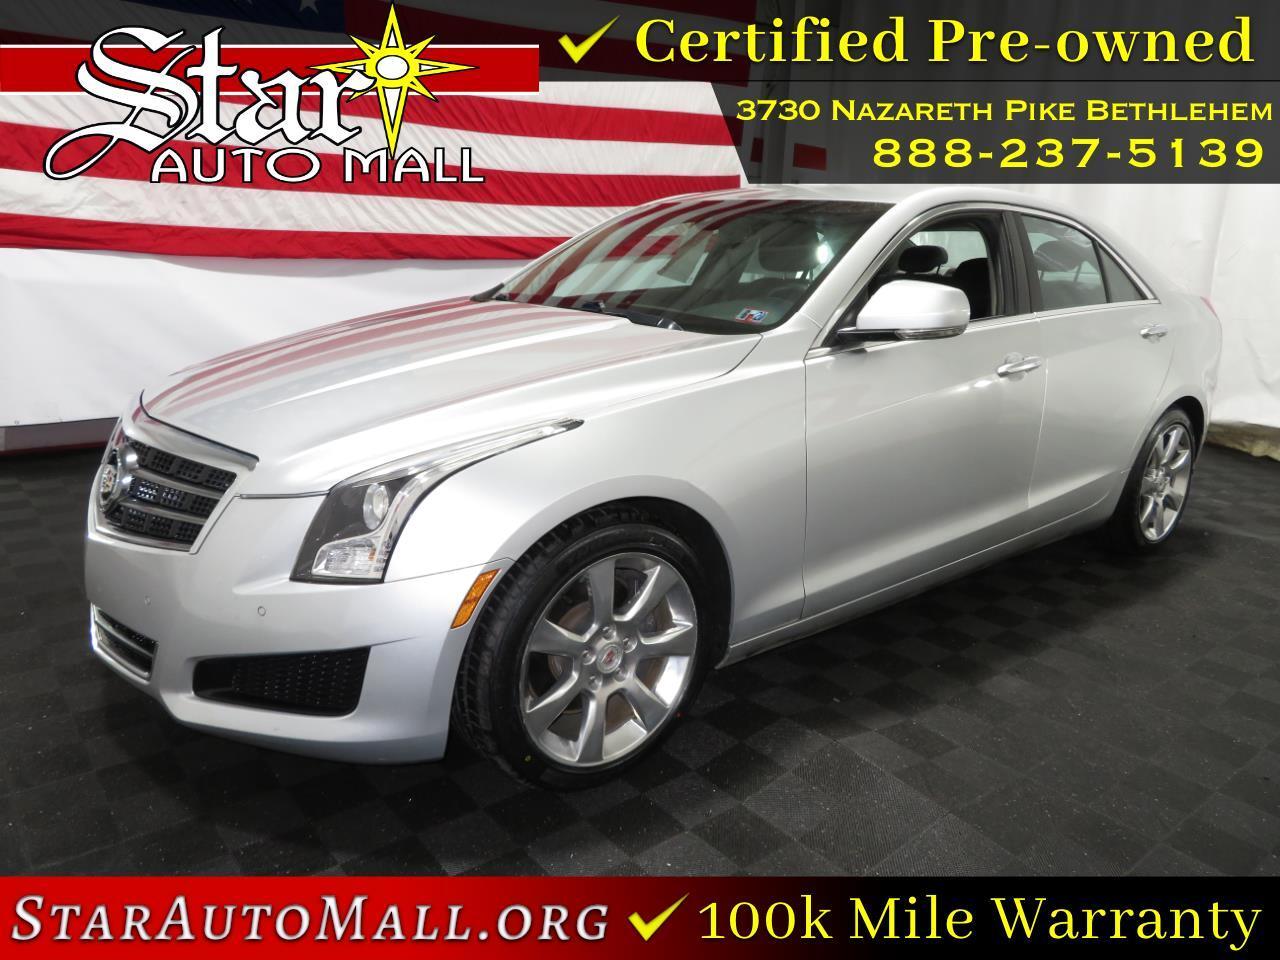 Cadillac ATS 4dr Sdn 2.0L Luxury RWD 2013